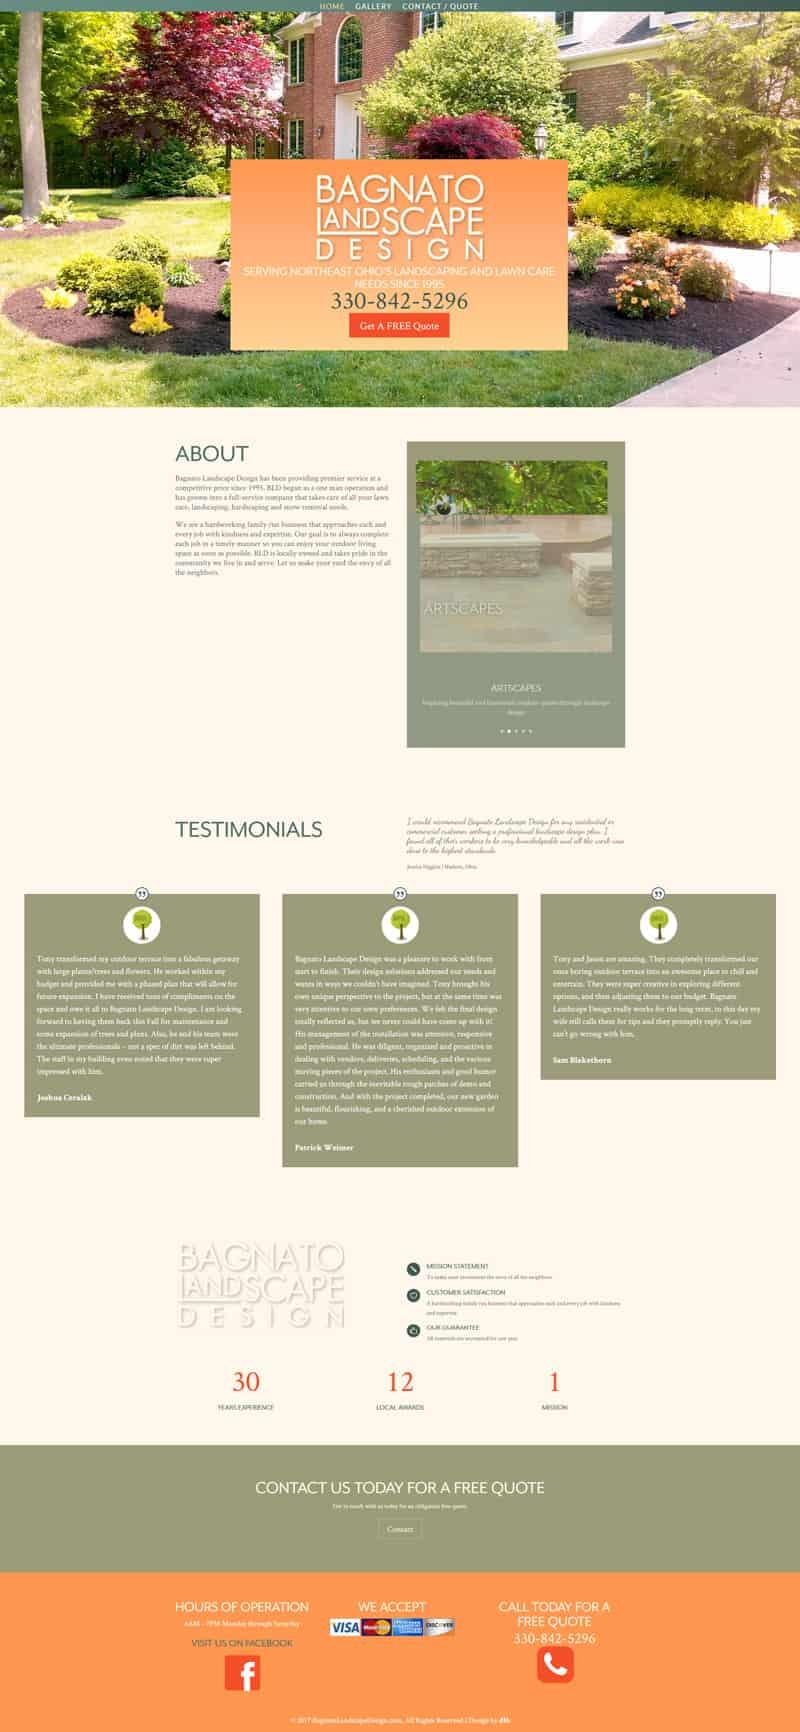 bagnato landscape design home page website design by dlb web media akron ohio